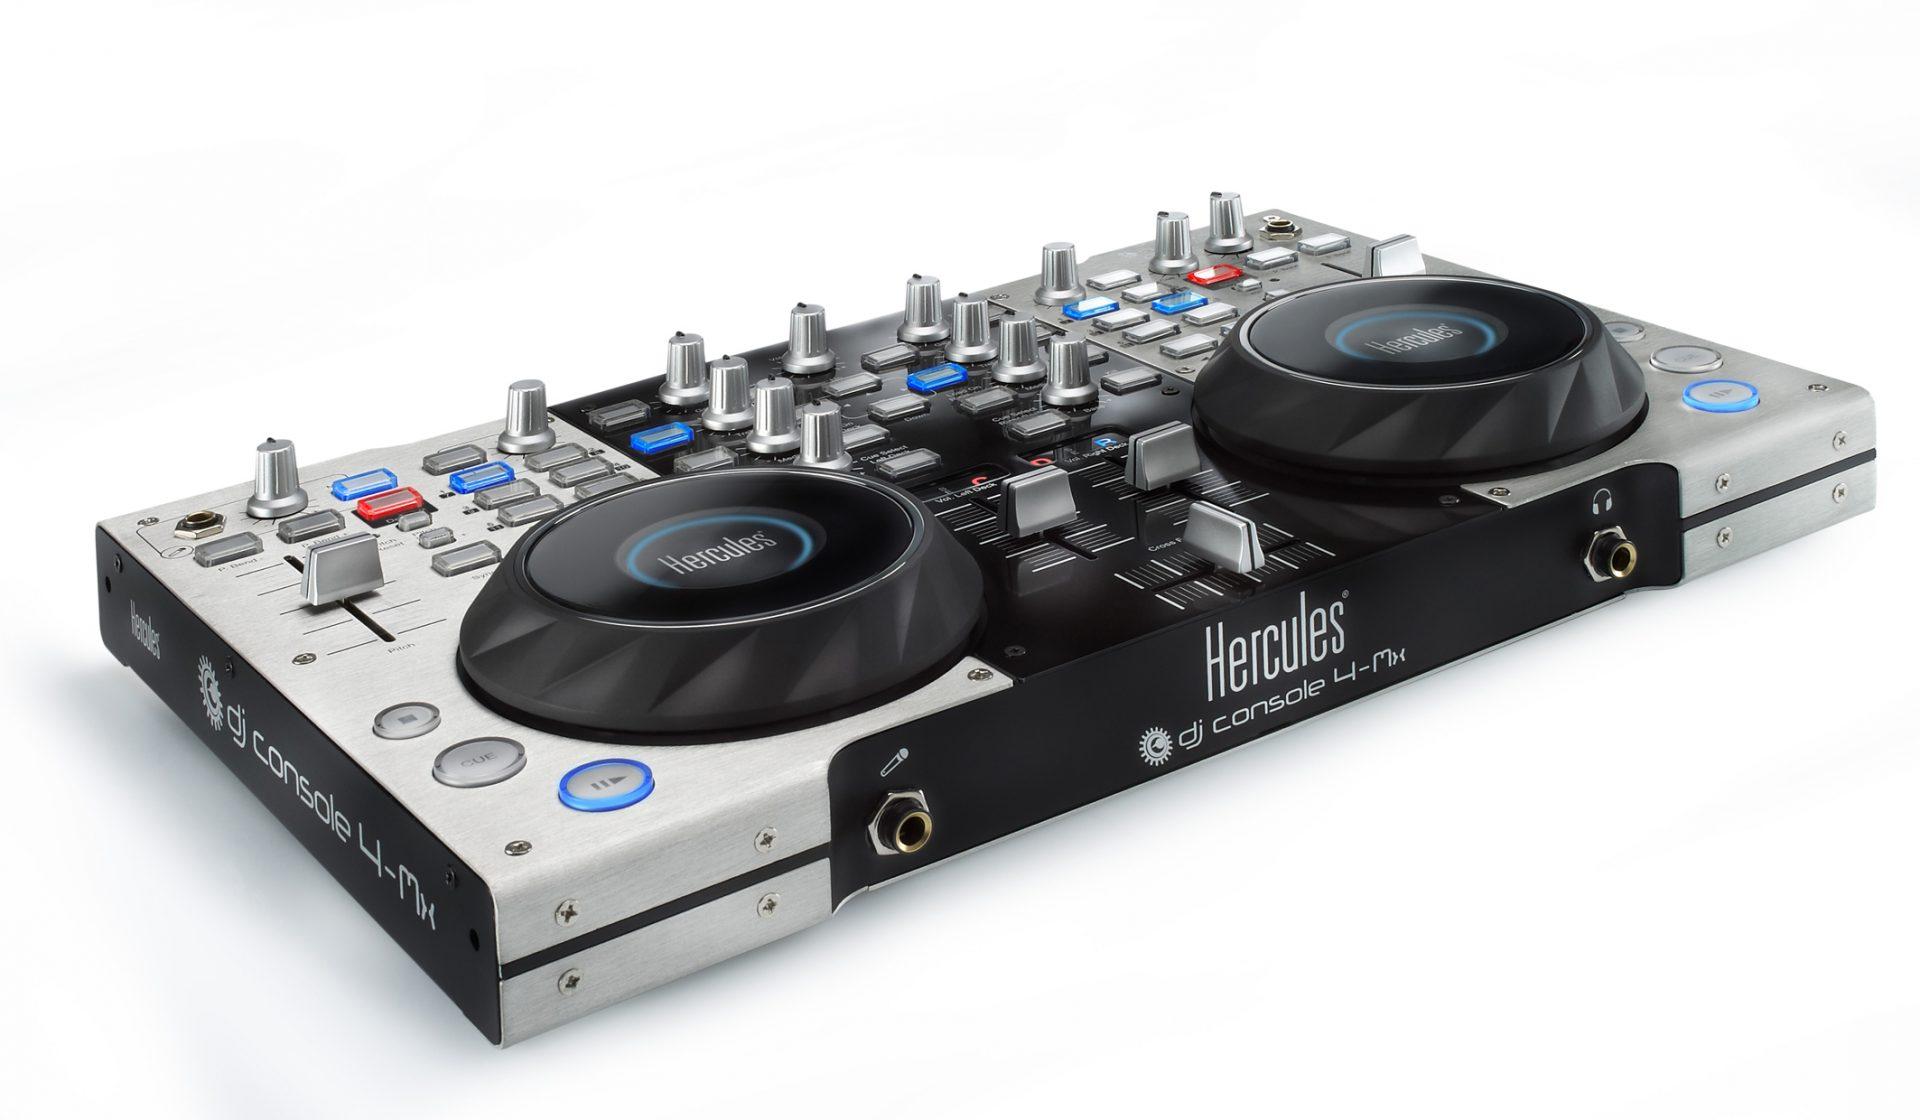 Hercules DJ Console 4 Mx